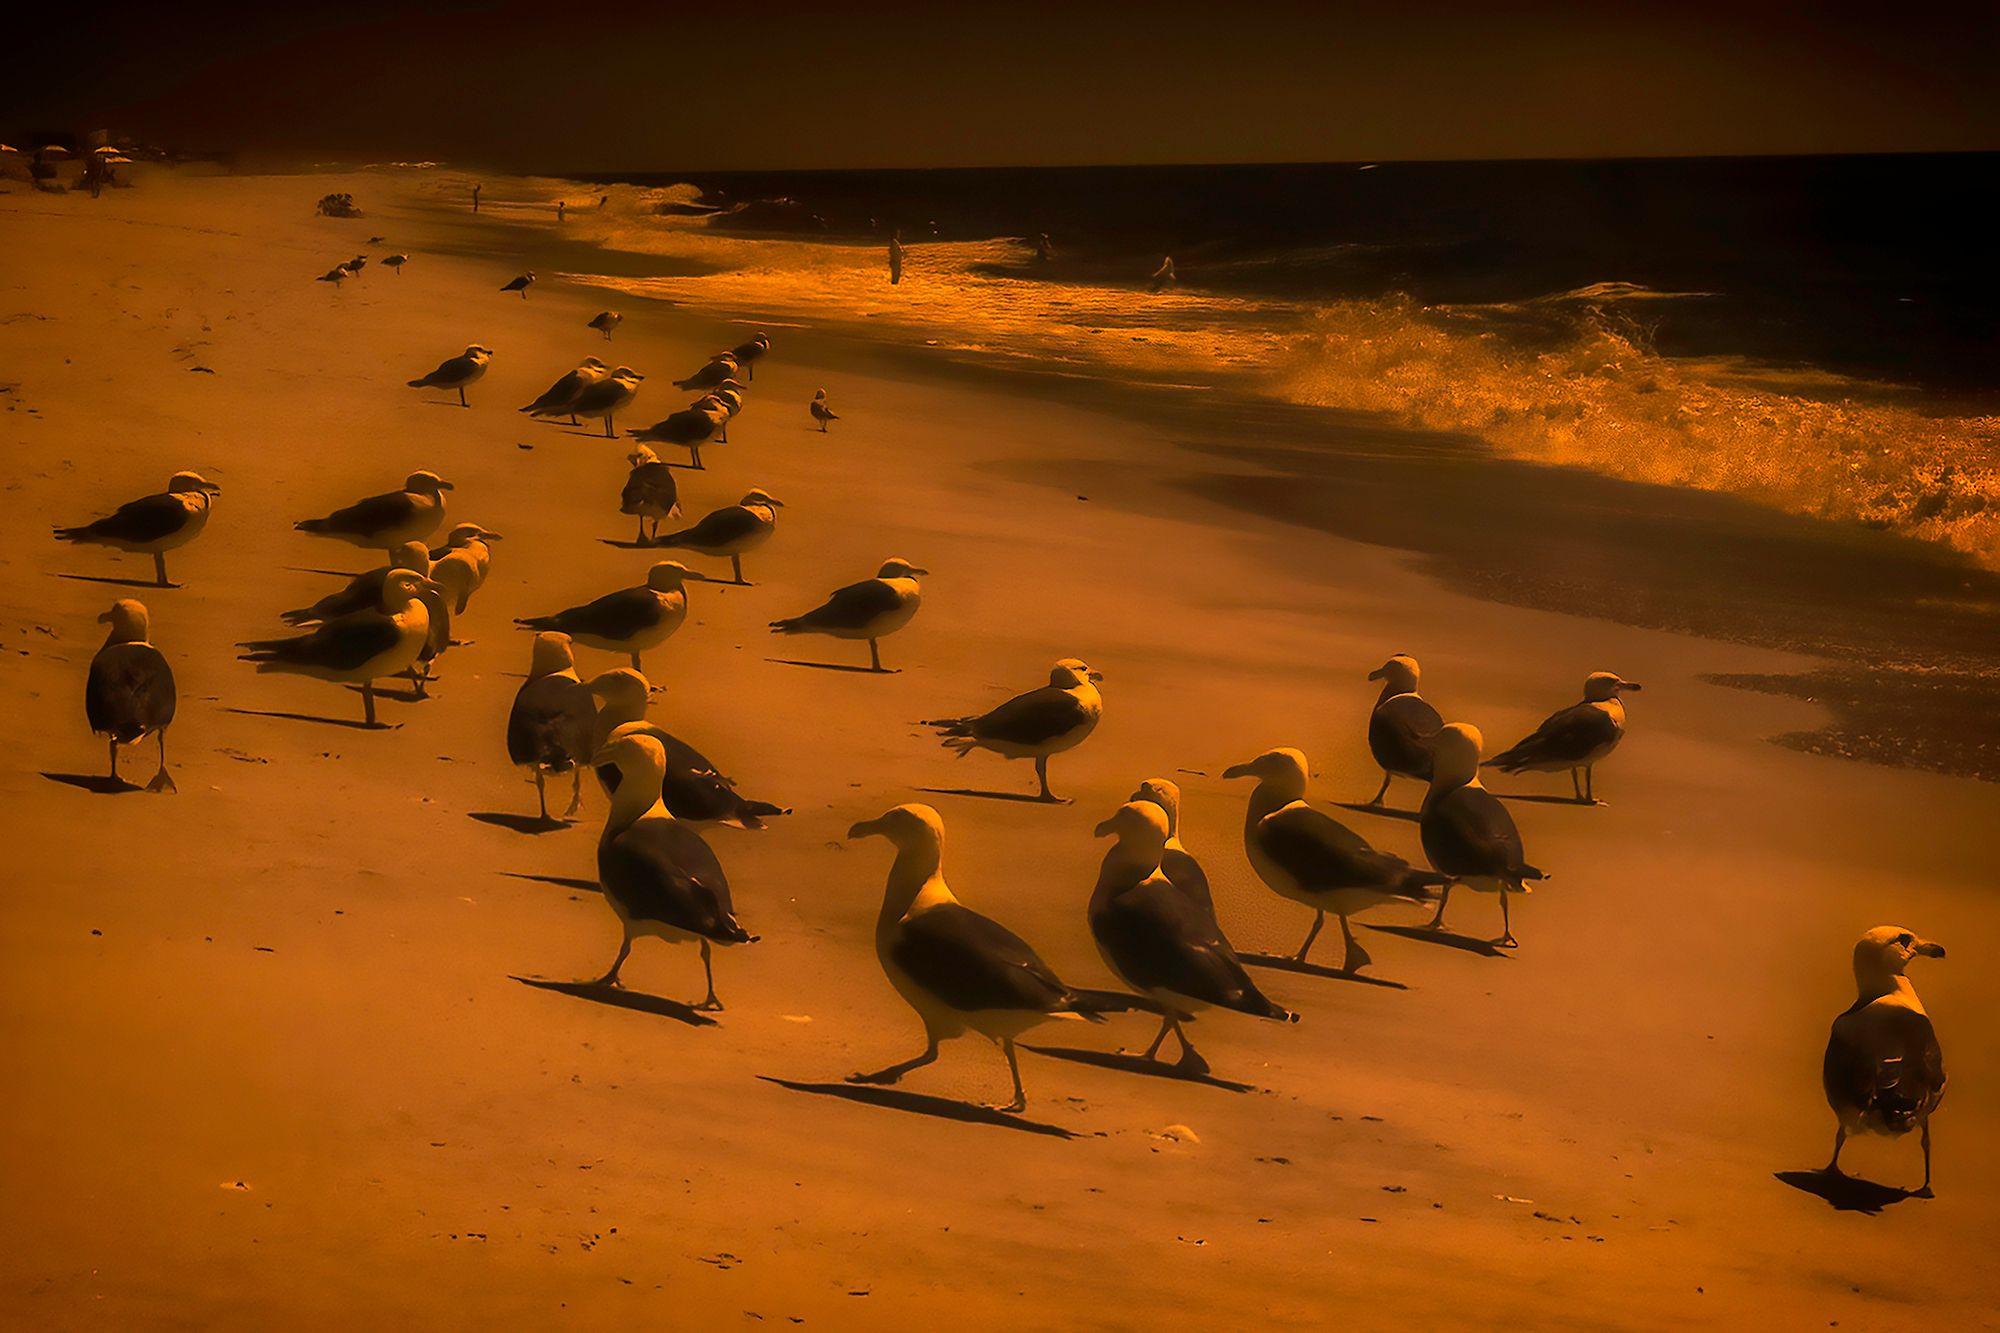 Shimmering Seagulls